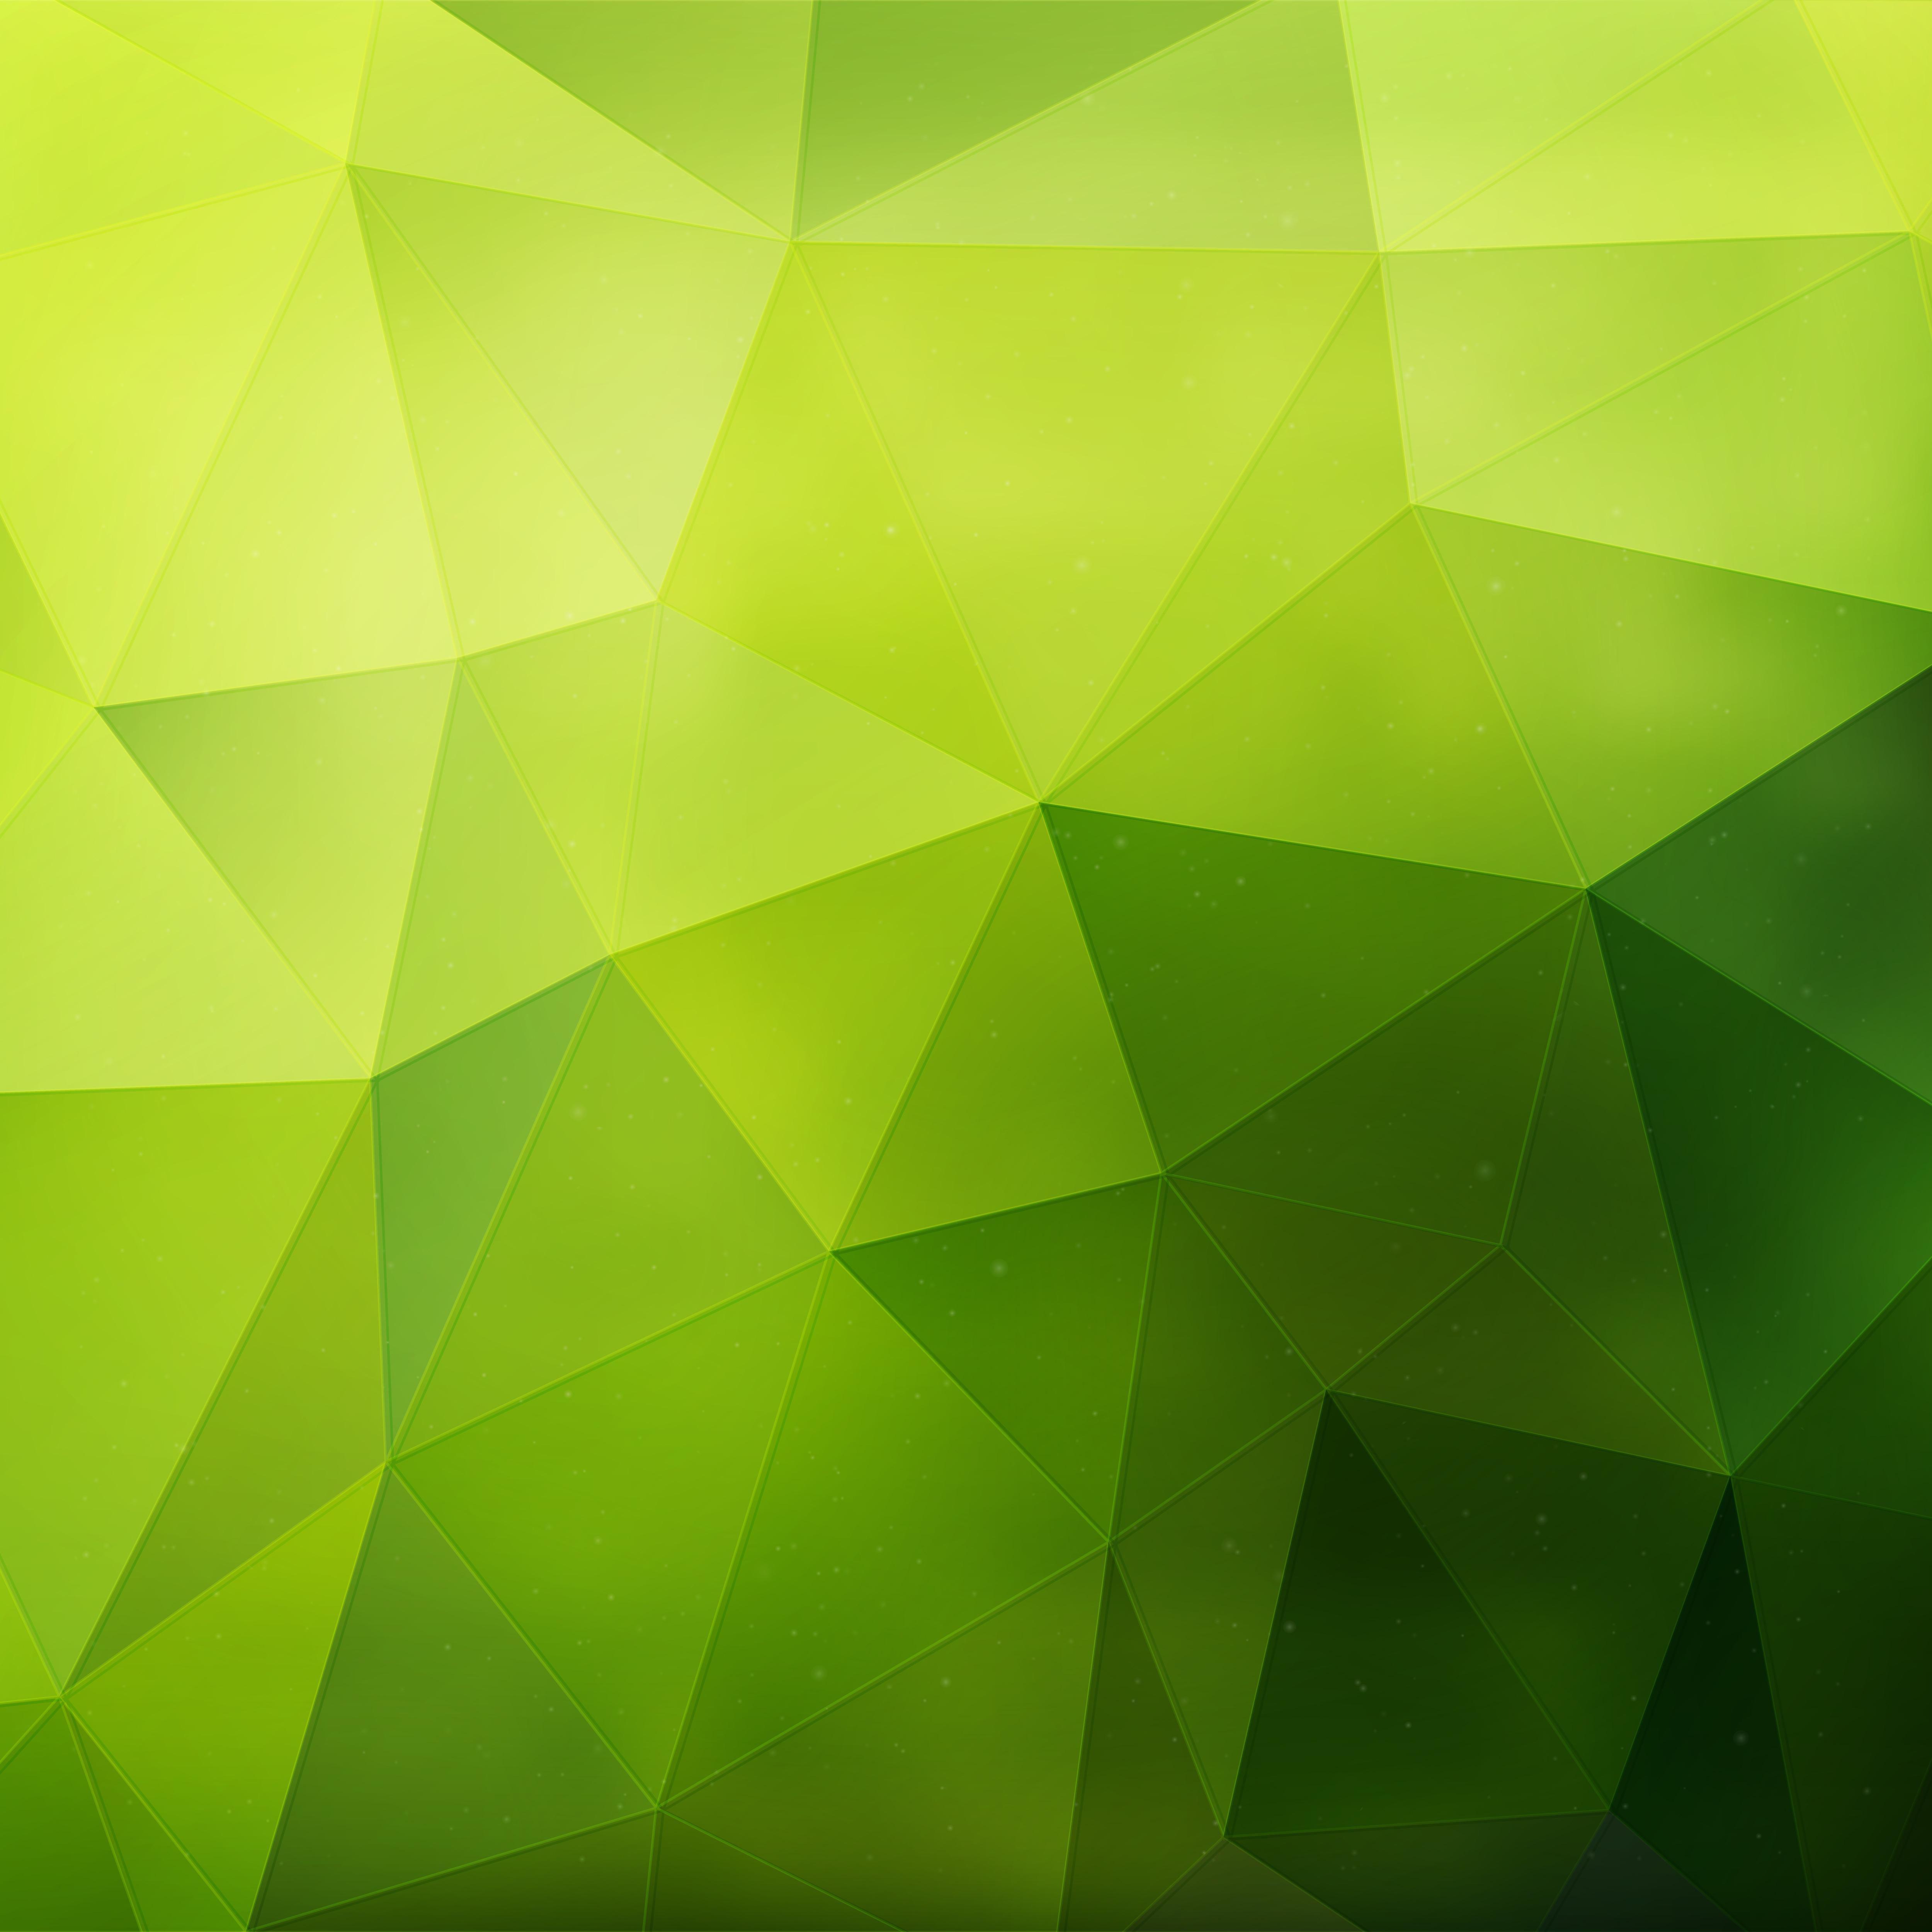 Green Geometric Background 570667 Vector Art At Vecteezy